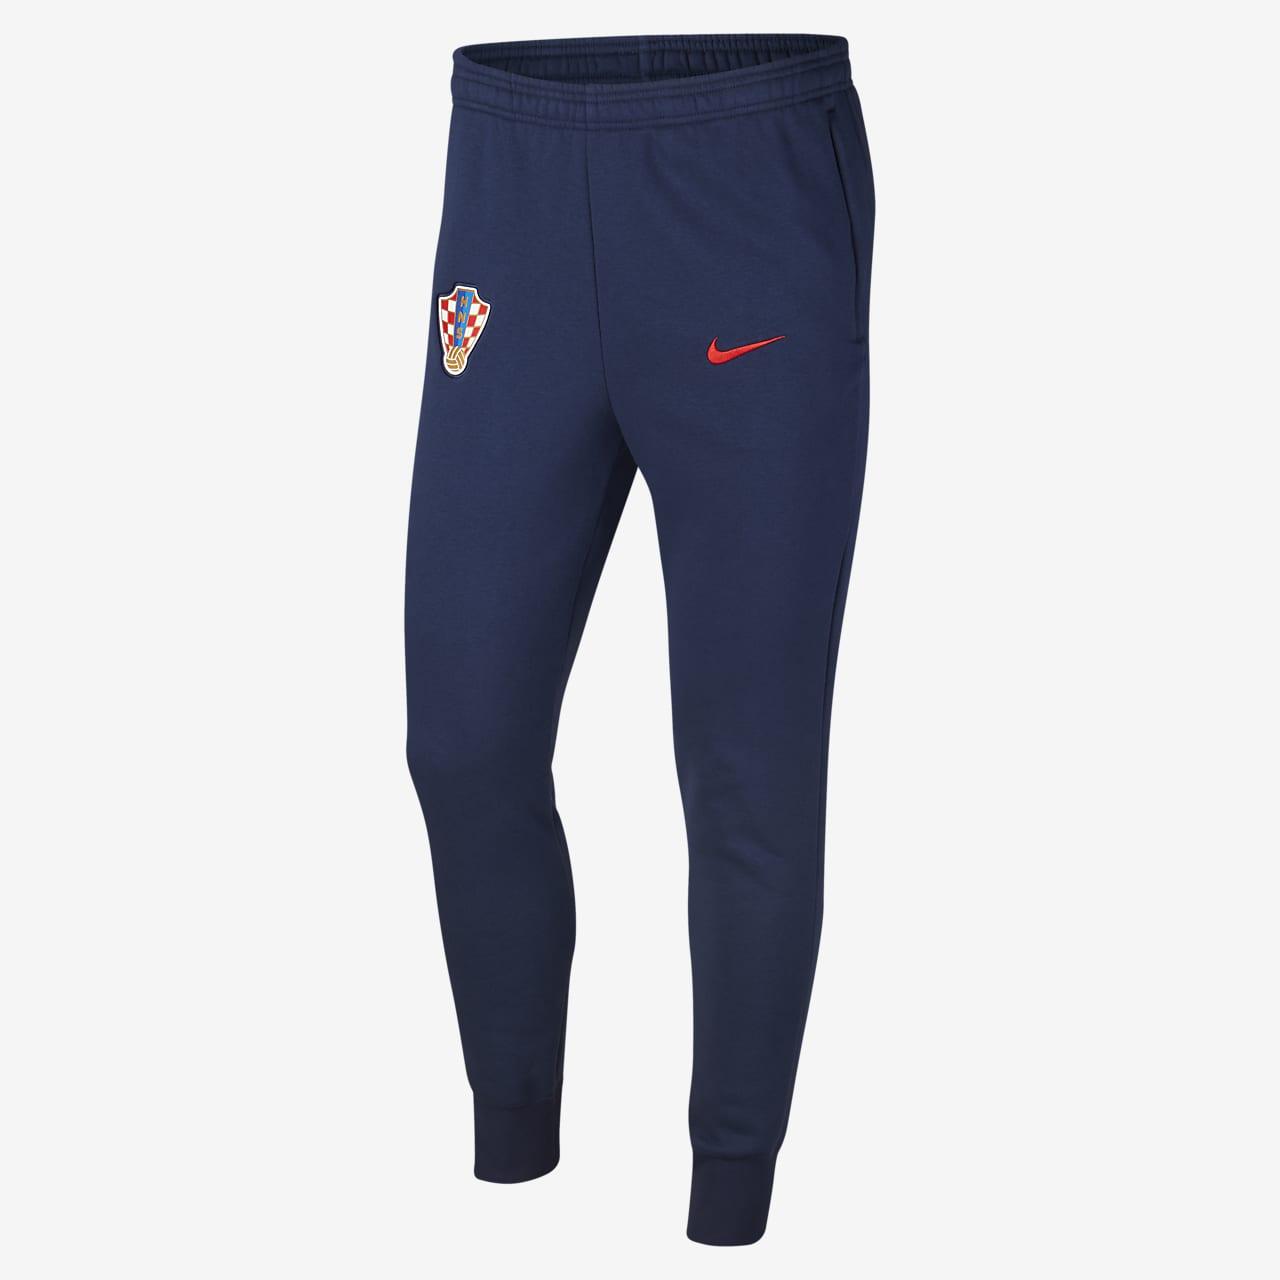 Pantalon de football en tissu Fleece Croatie pour Homme